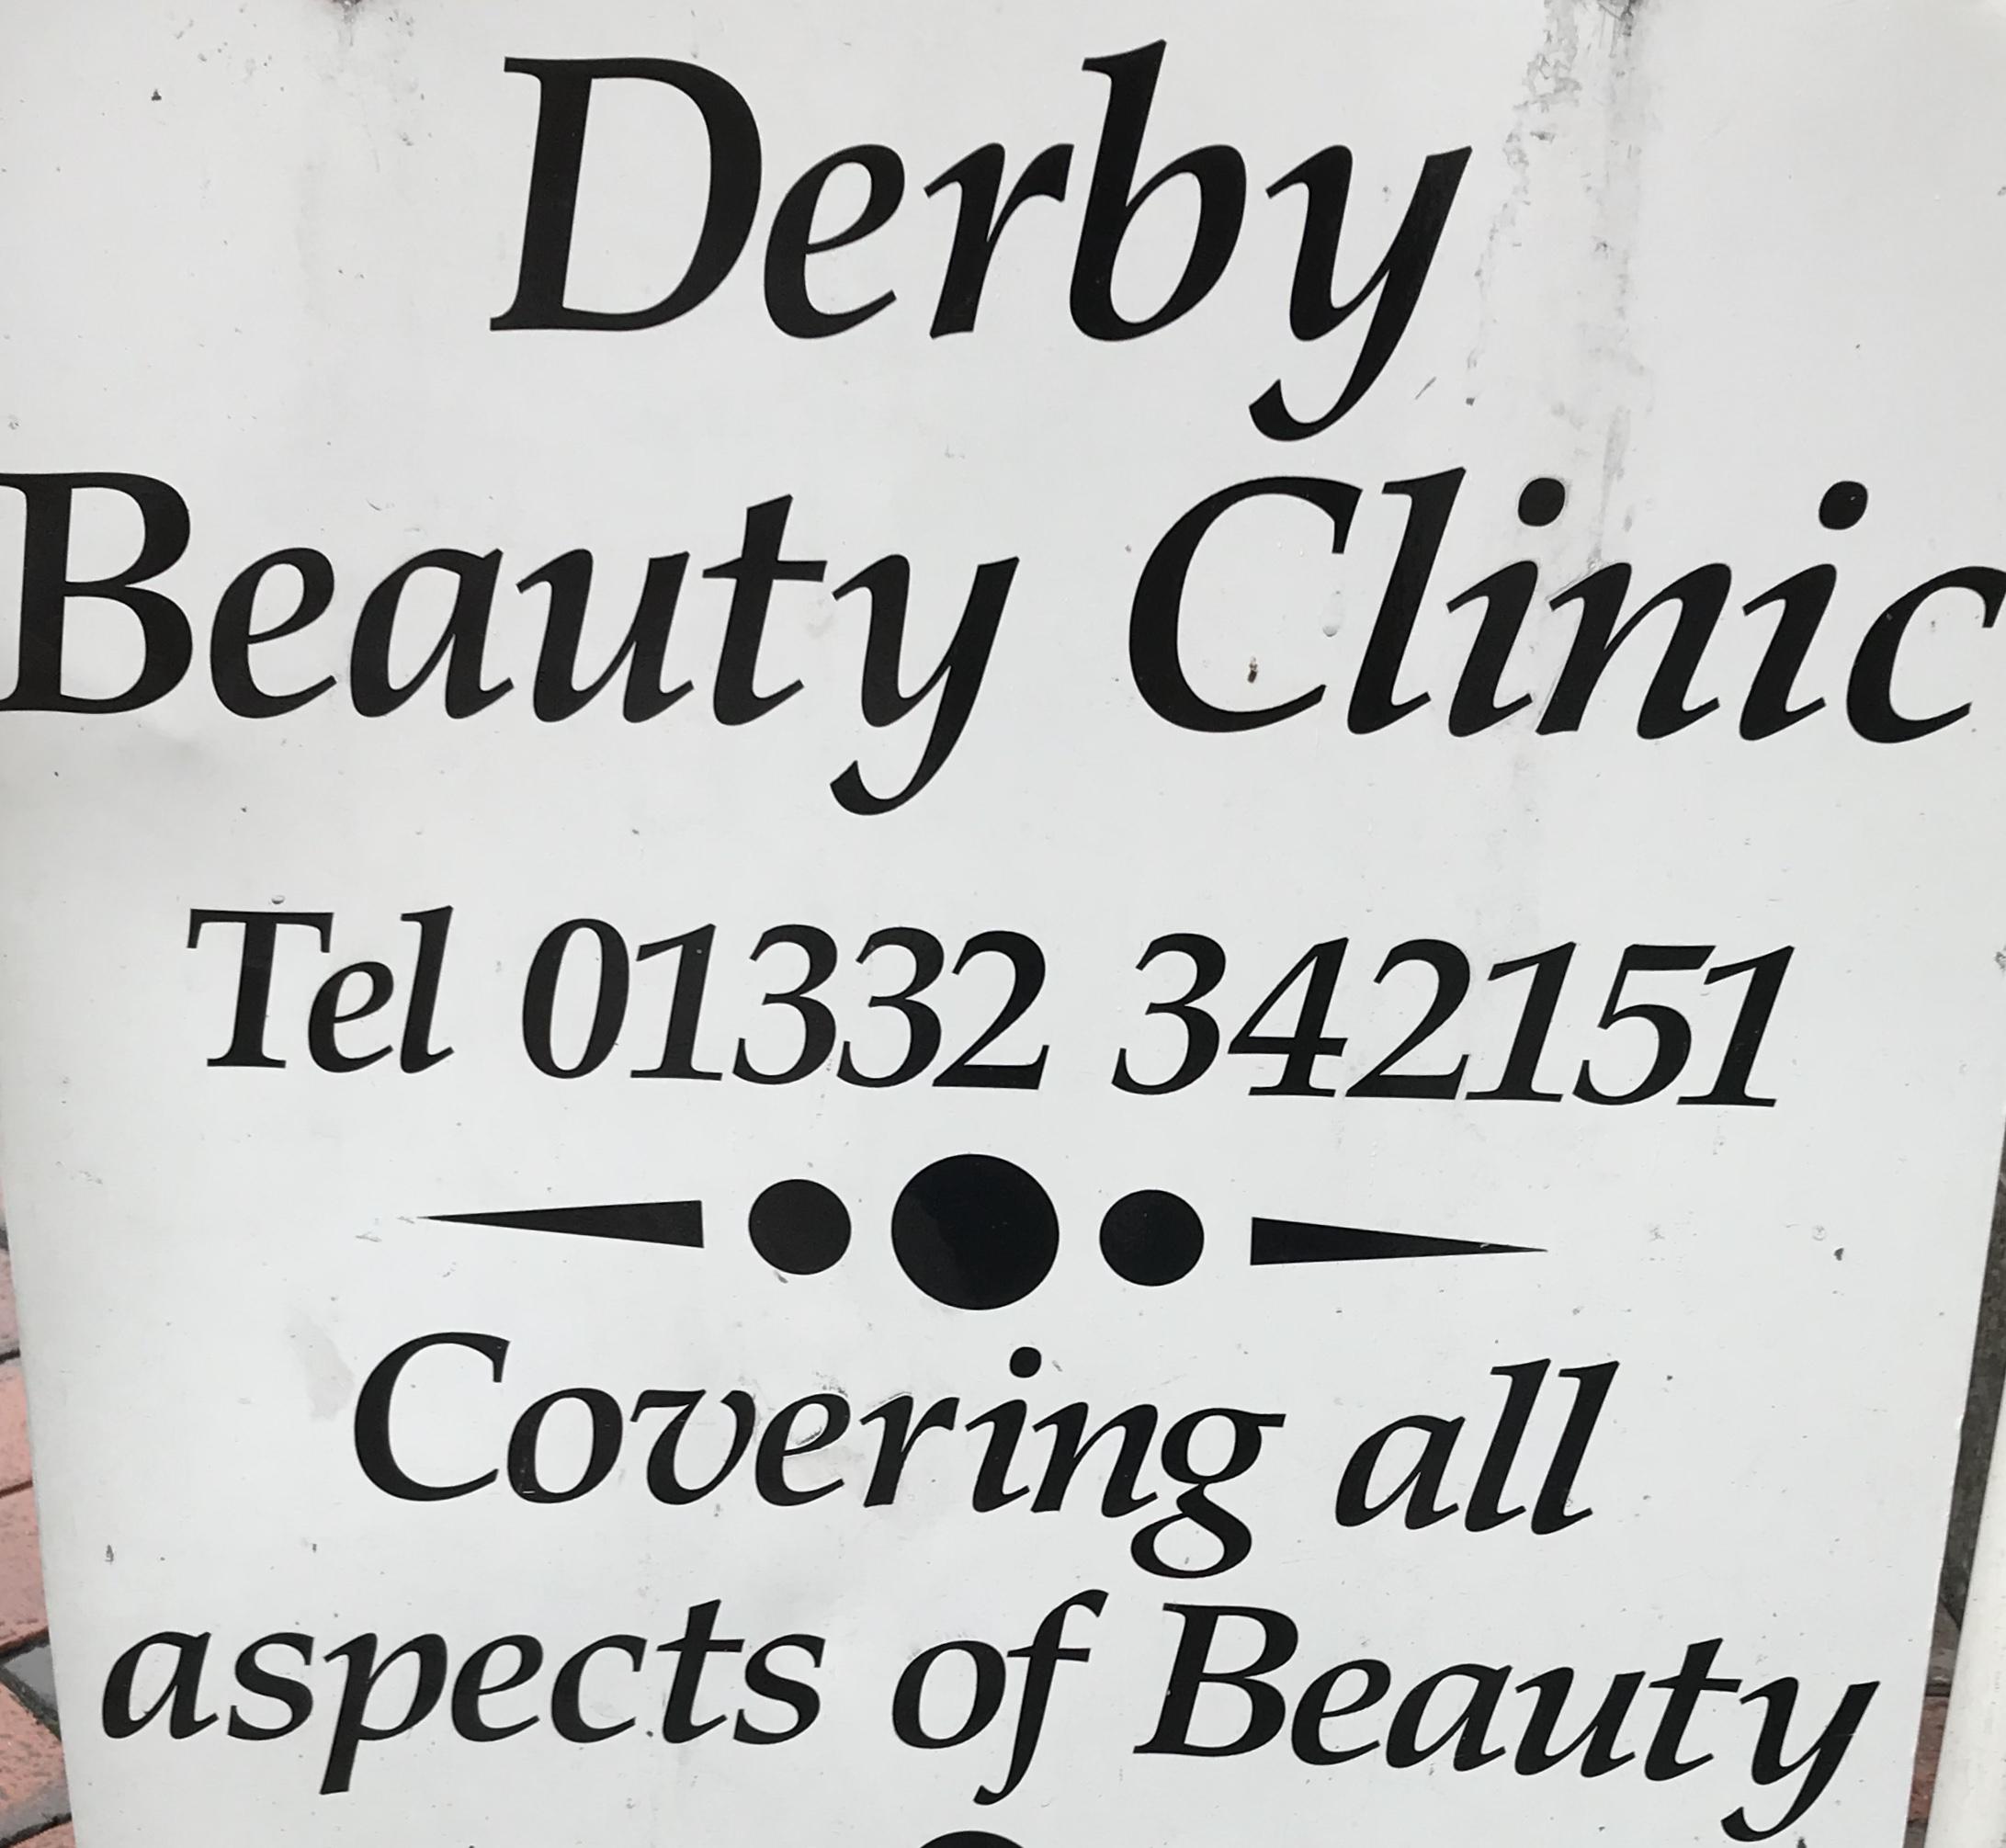 Derby Electrolysis & Beauty Clinic